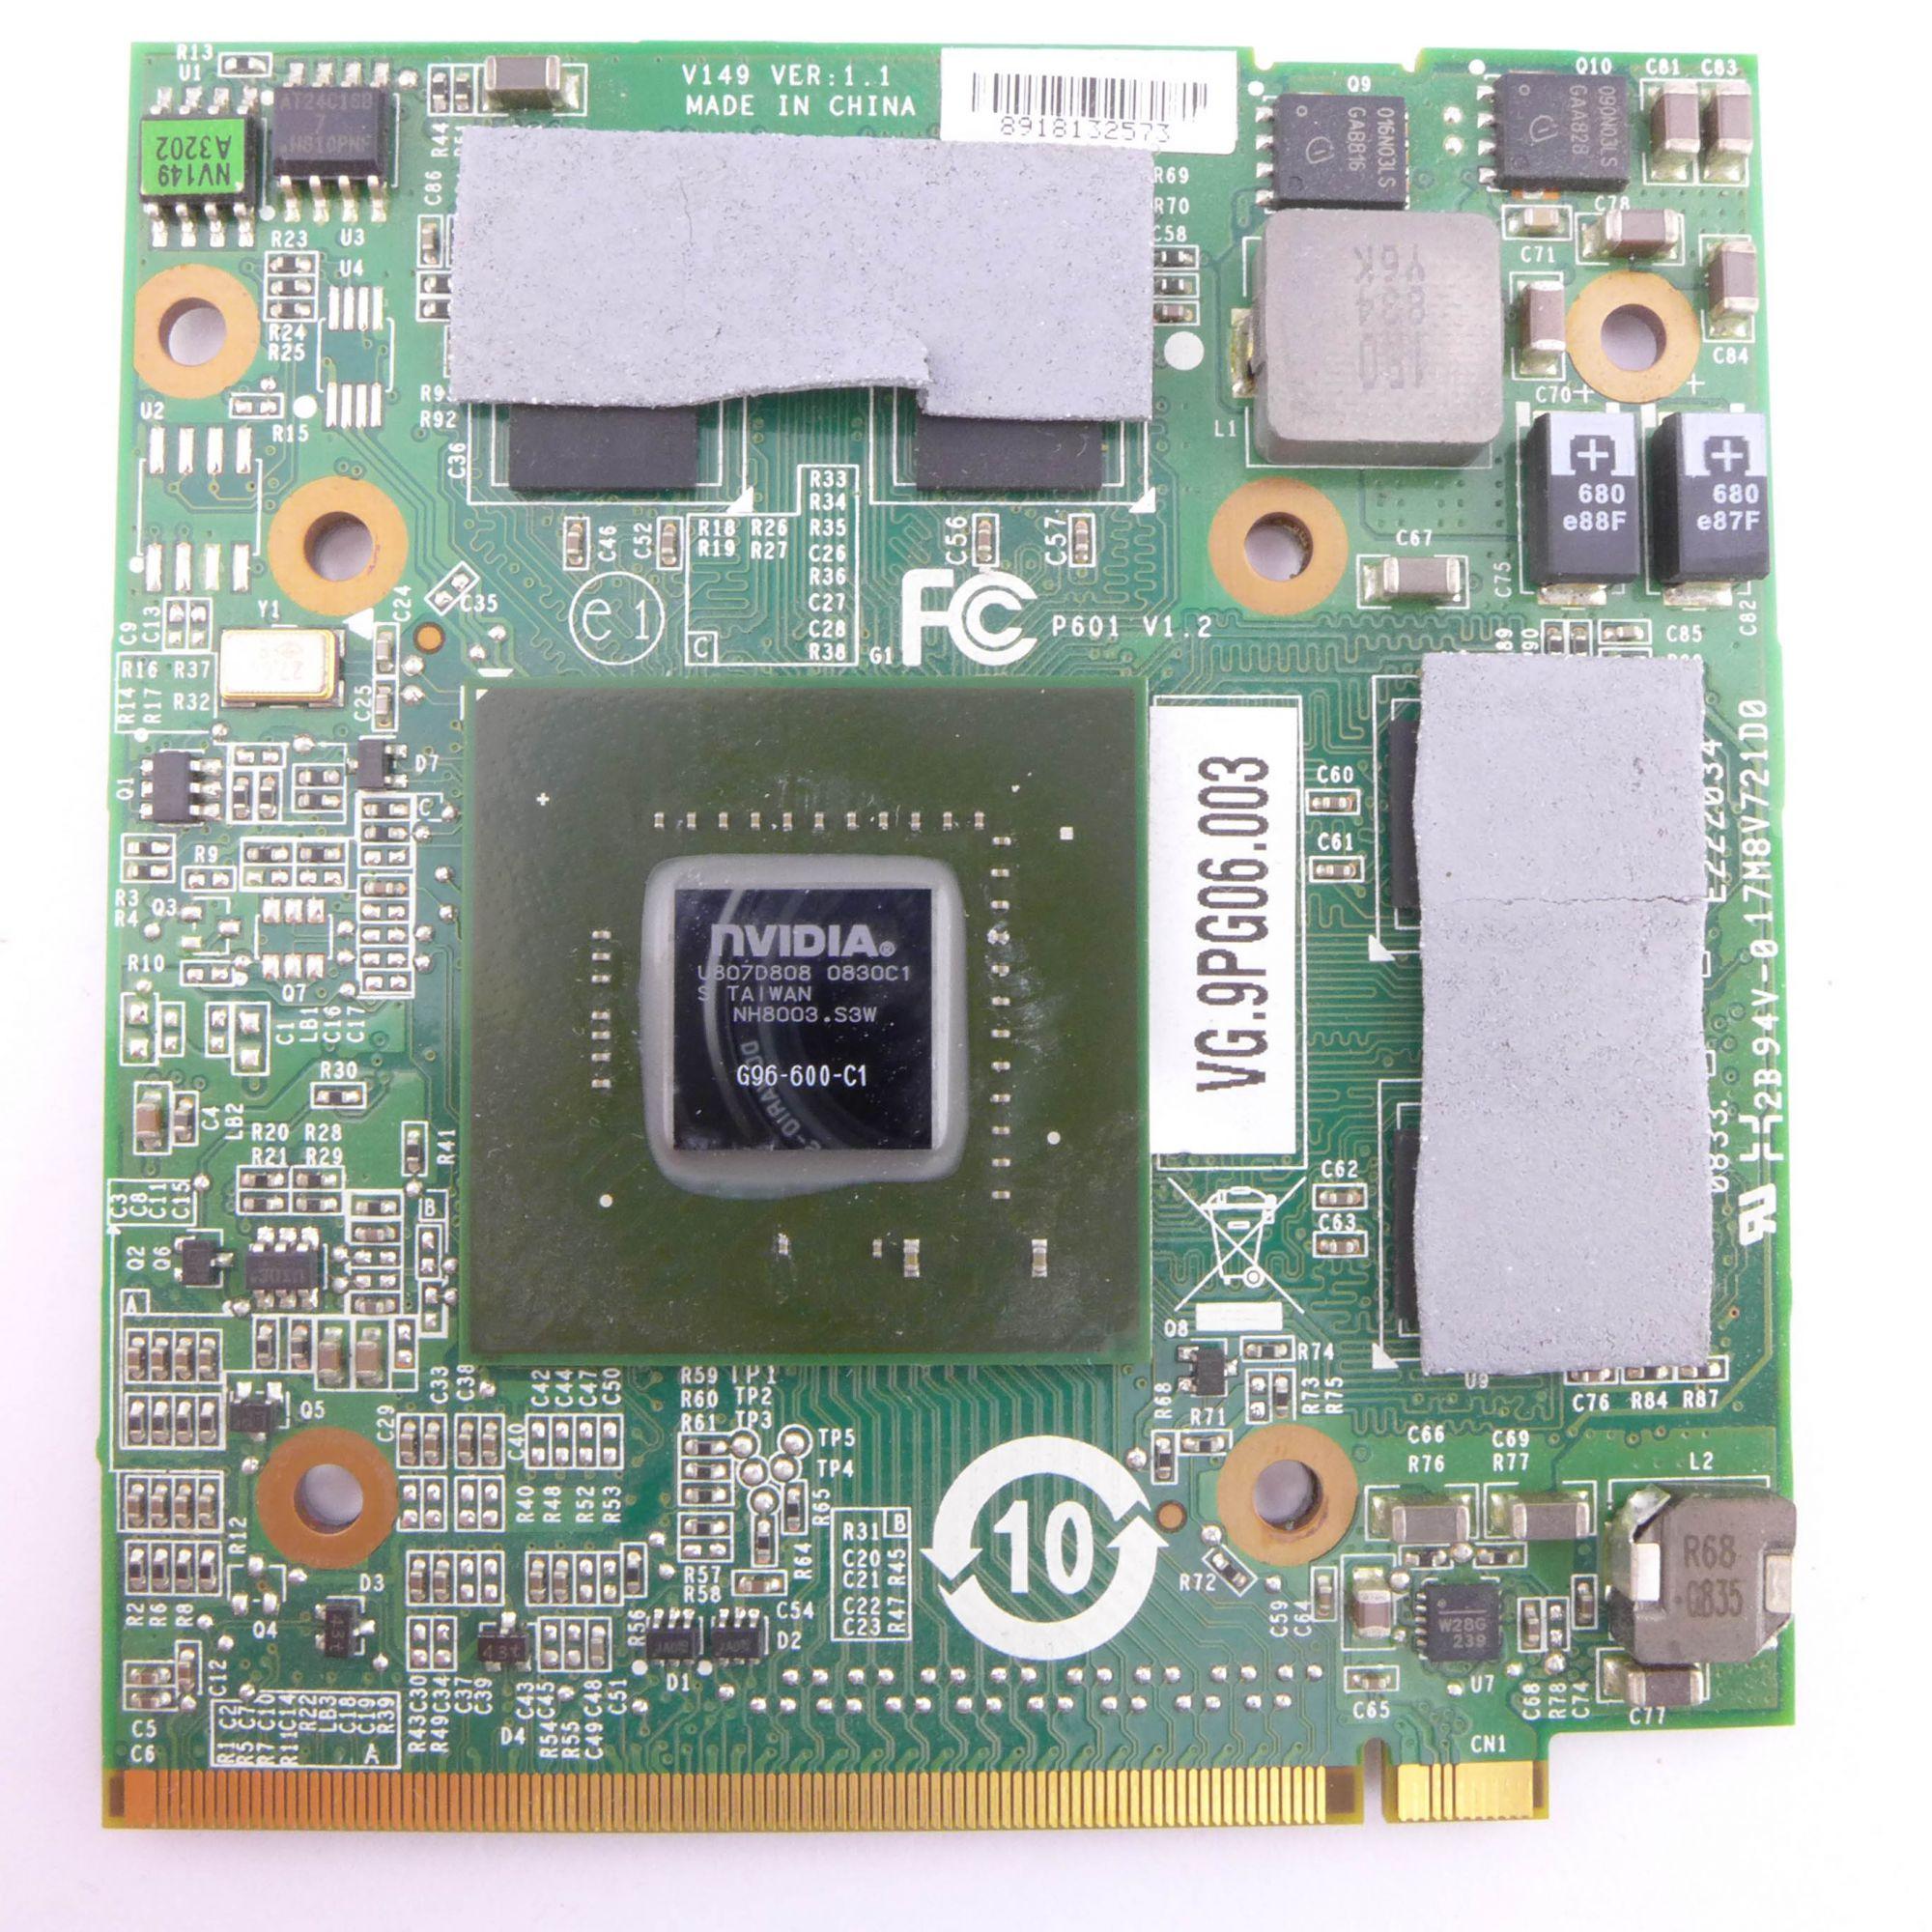 Acer Aspire 6930 Graphic Card VG.9PG06.003 GPU